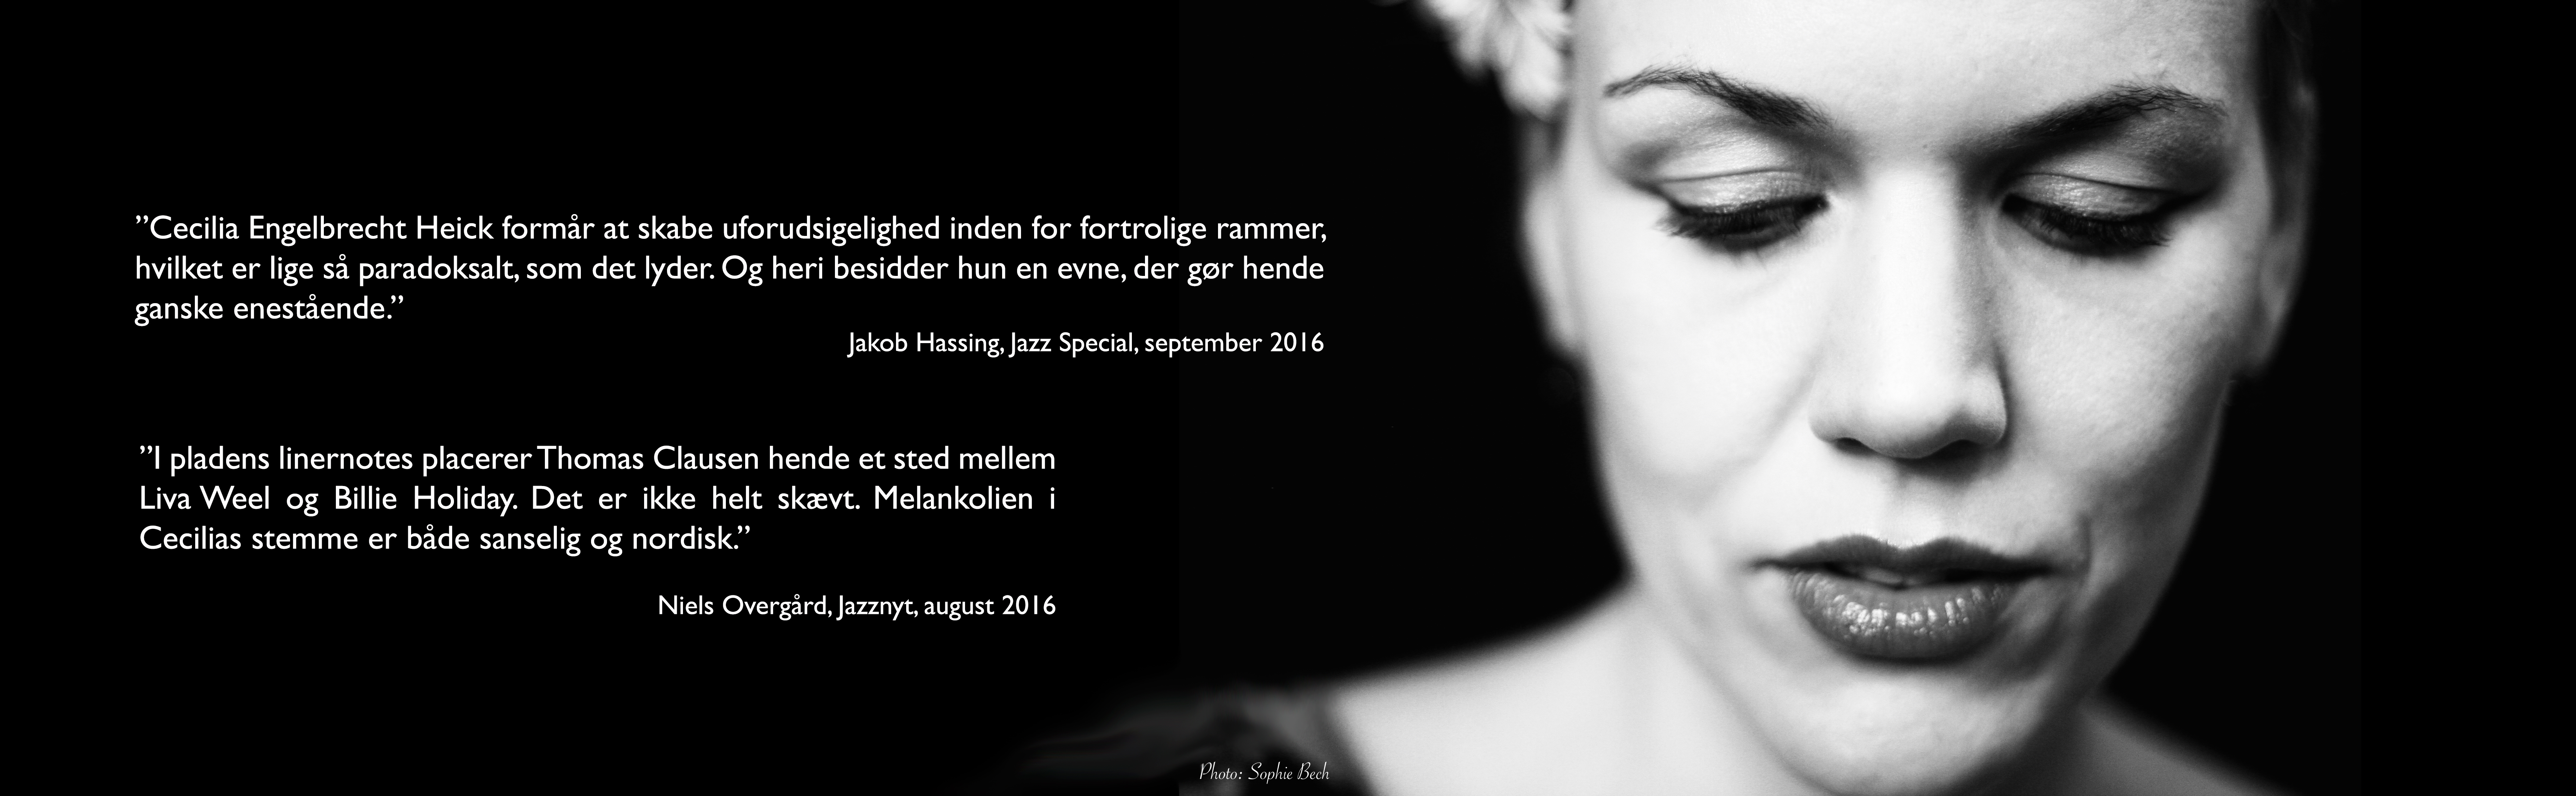 Cecilia Engelbrecht Heick